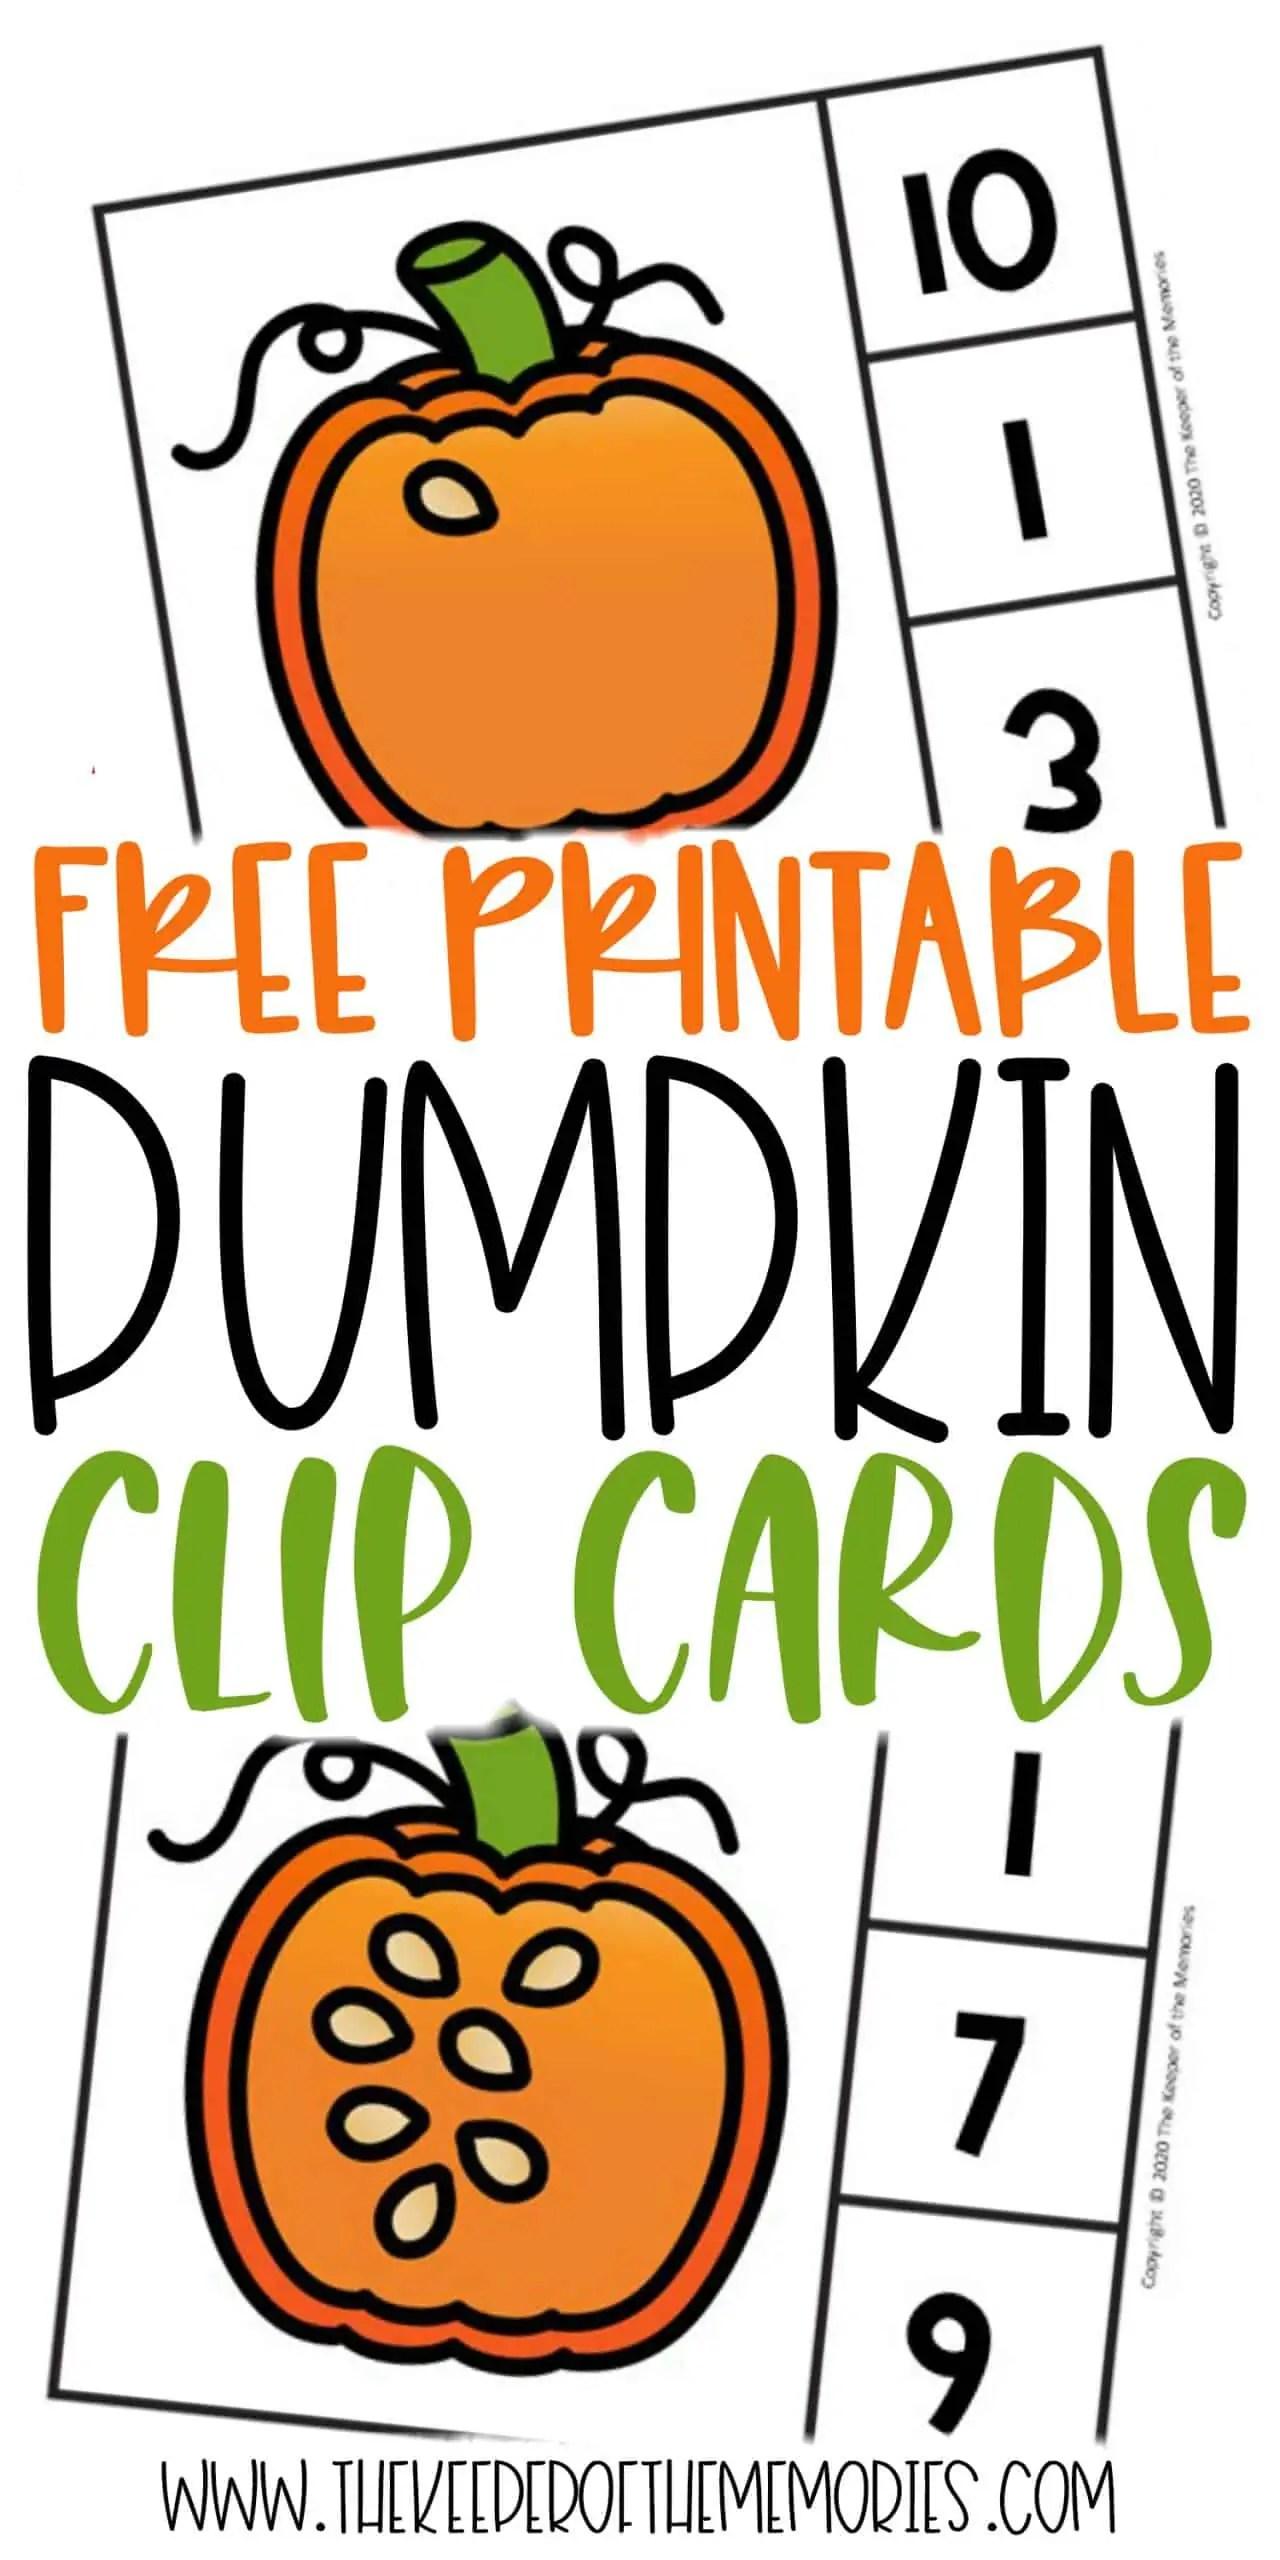 Counting Pumpkin Seeds Halloween Numbers Printable Clip